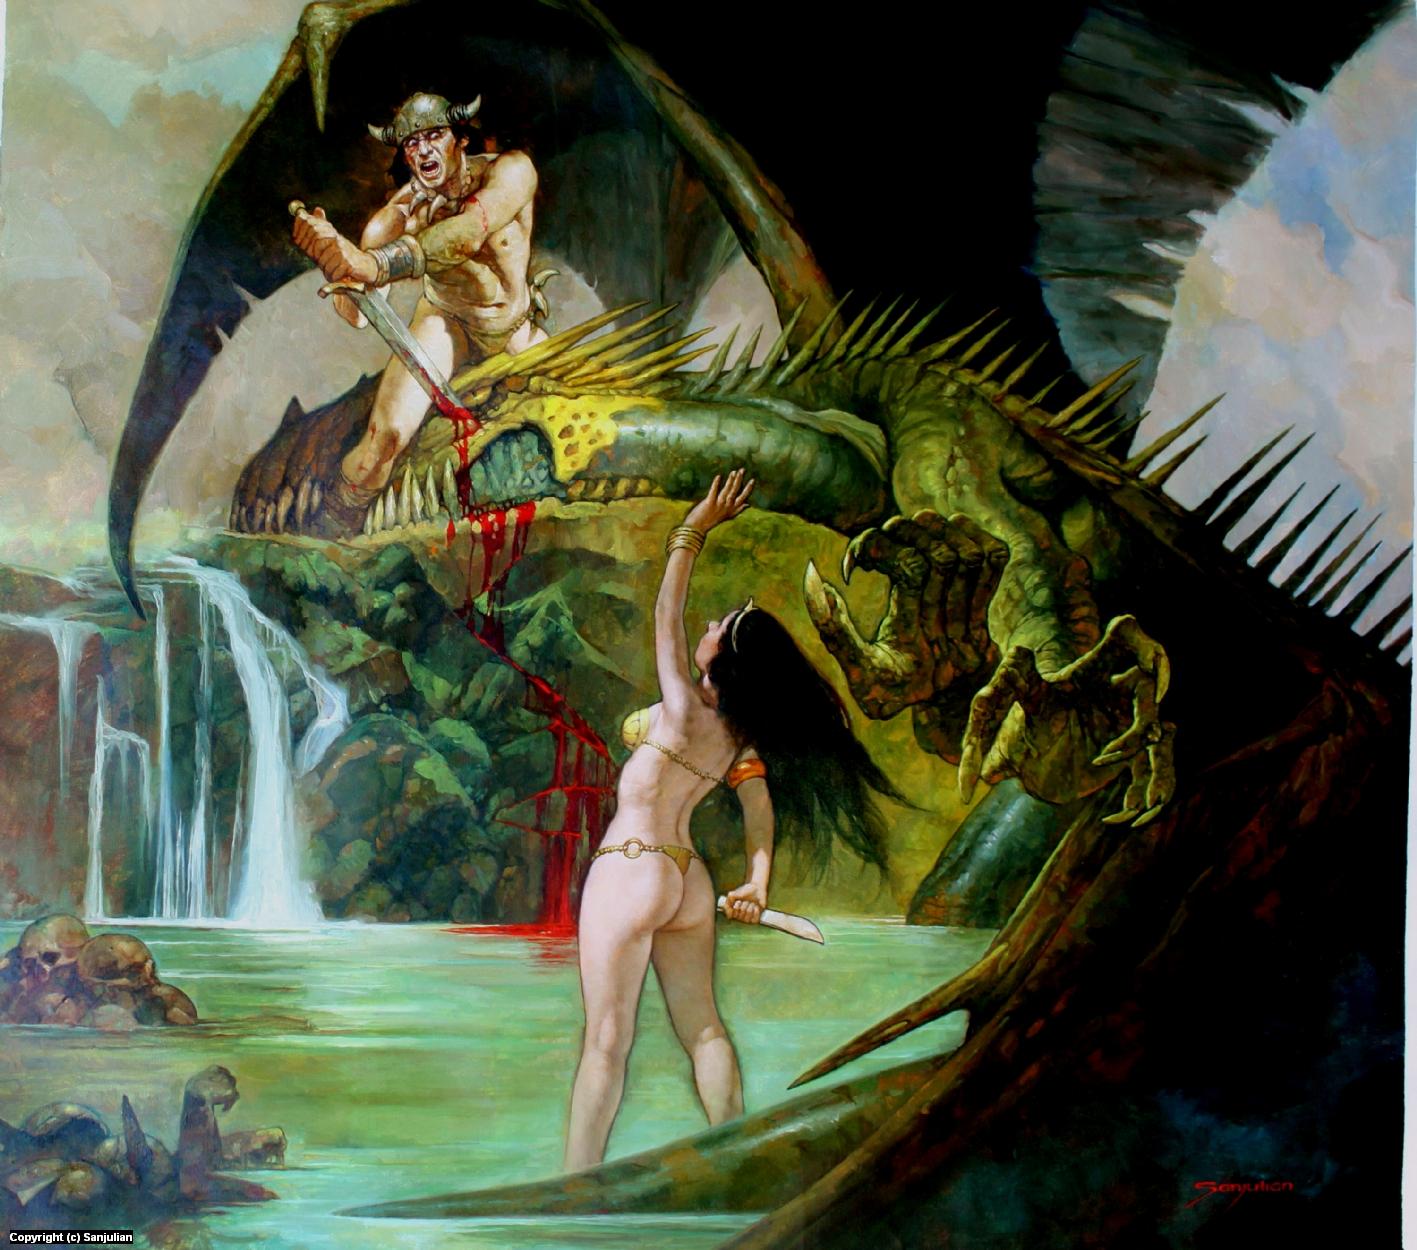 Dragon Queen Artwork by Manuel Sanjulian